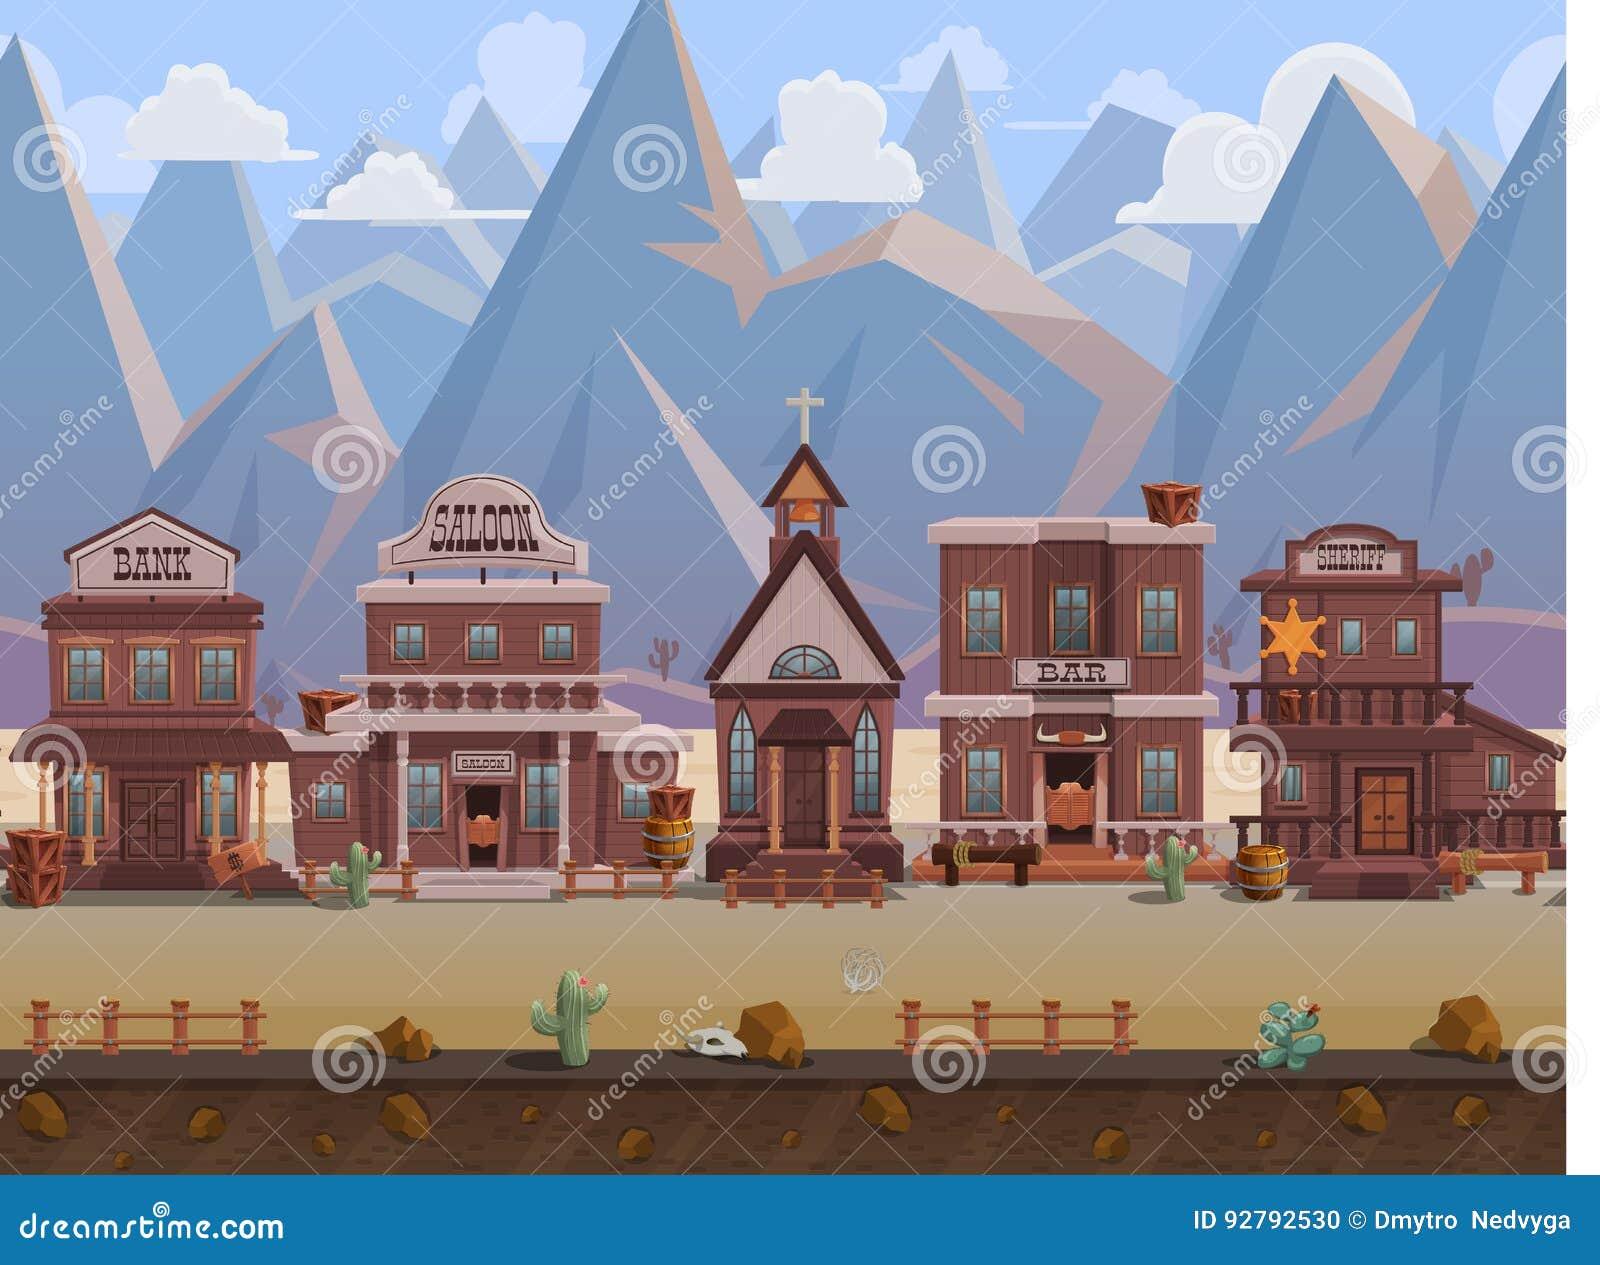 Town Landscape Vector Illustration: Seamless Cartoon Wild West Town, Western Landscape, Vector